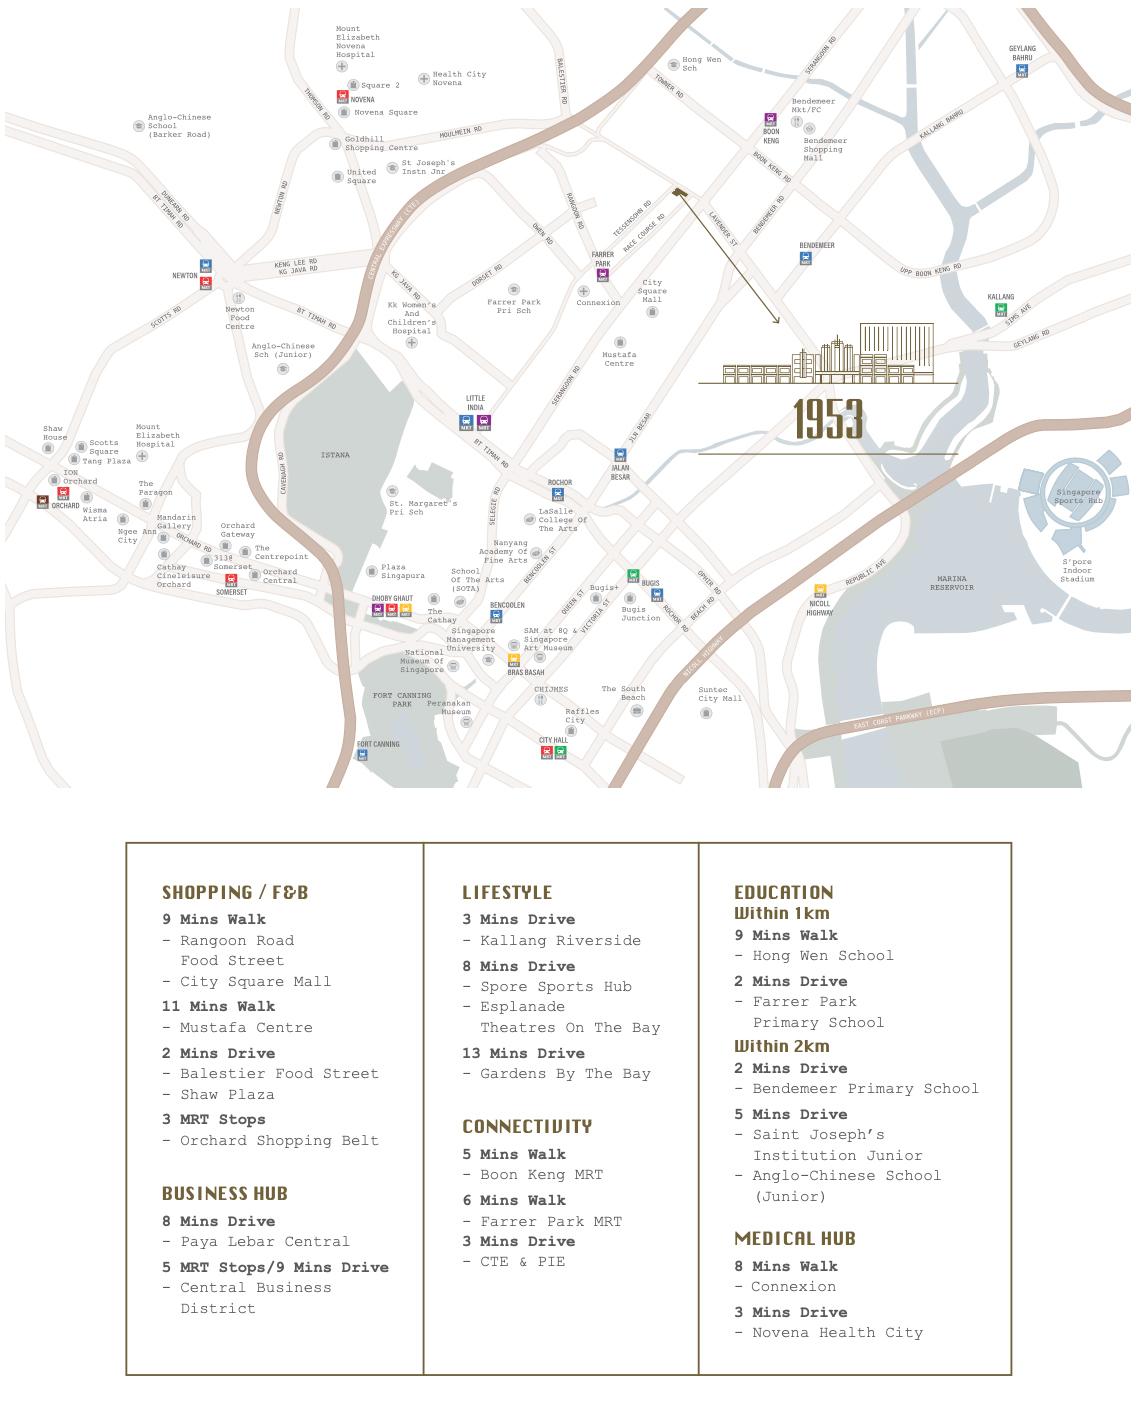 1953-new-condo-singapore-location-map